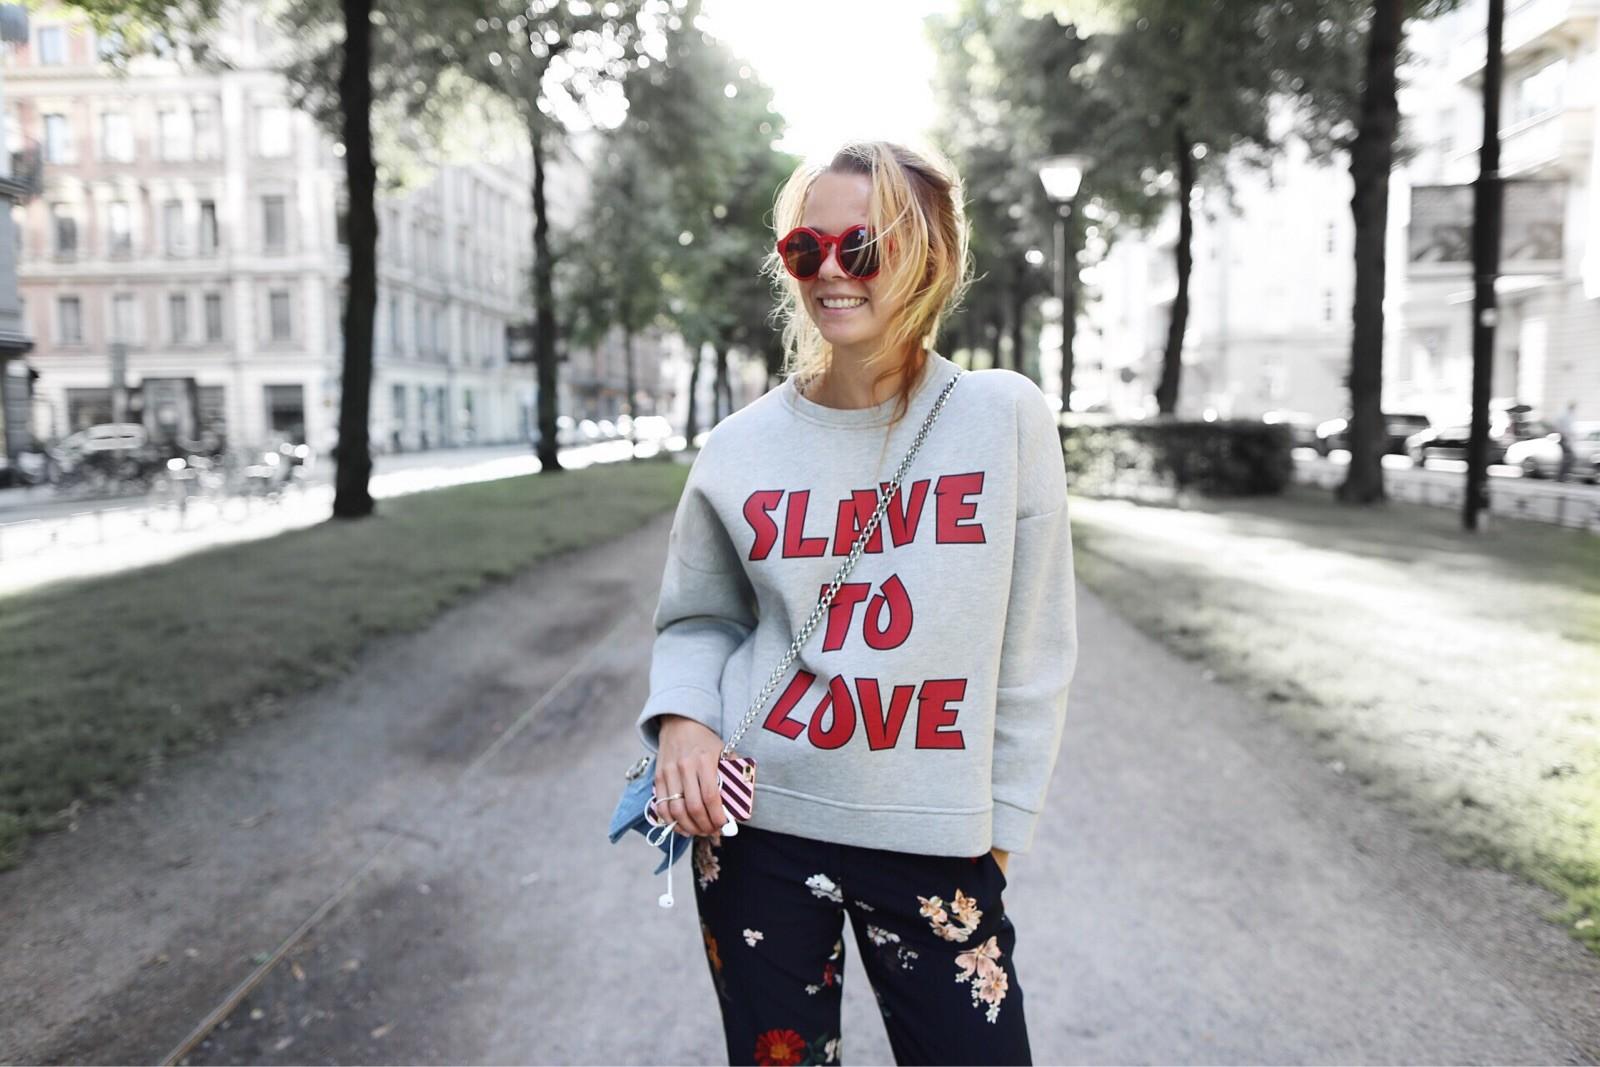 Slave to love!